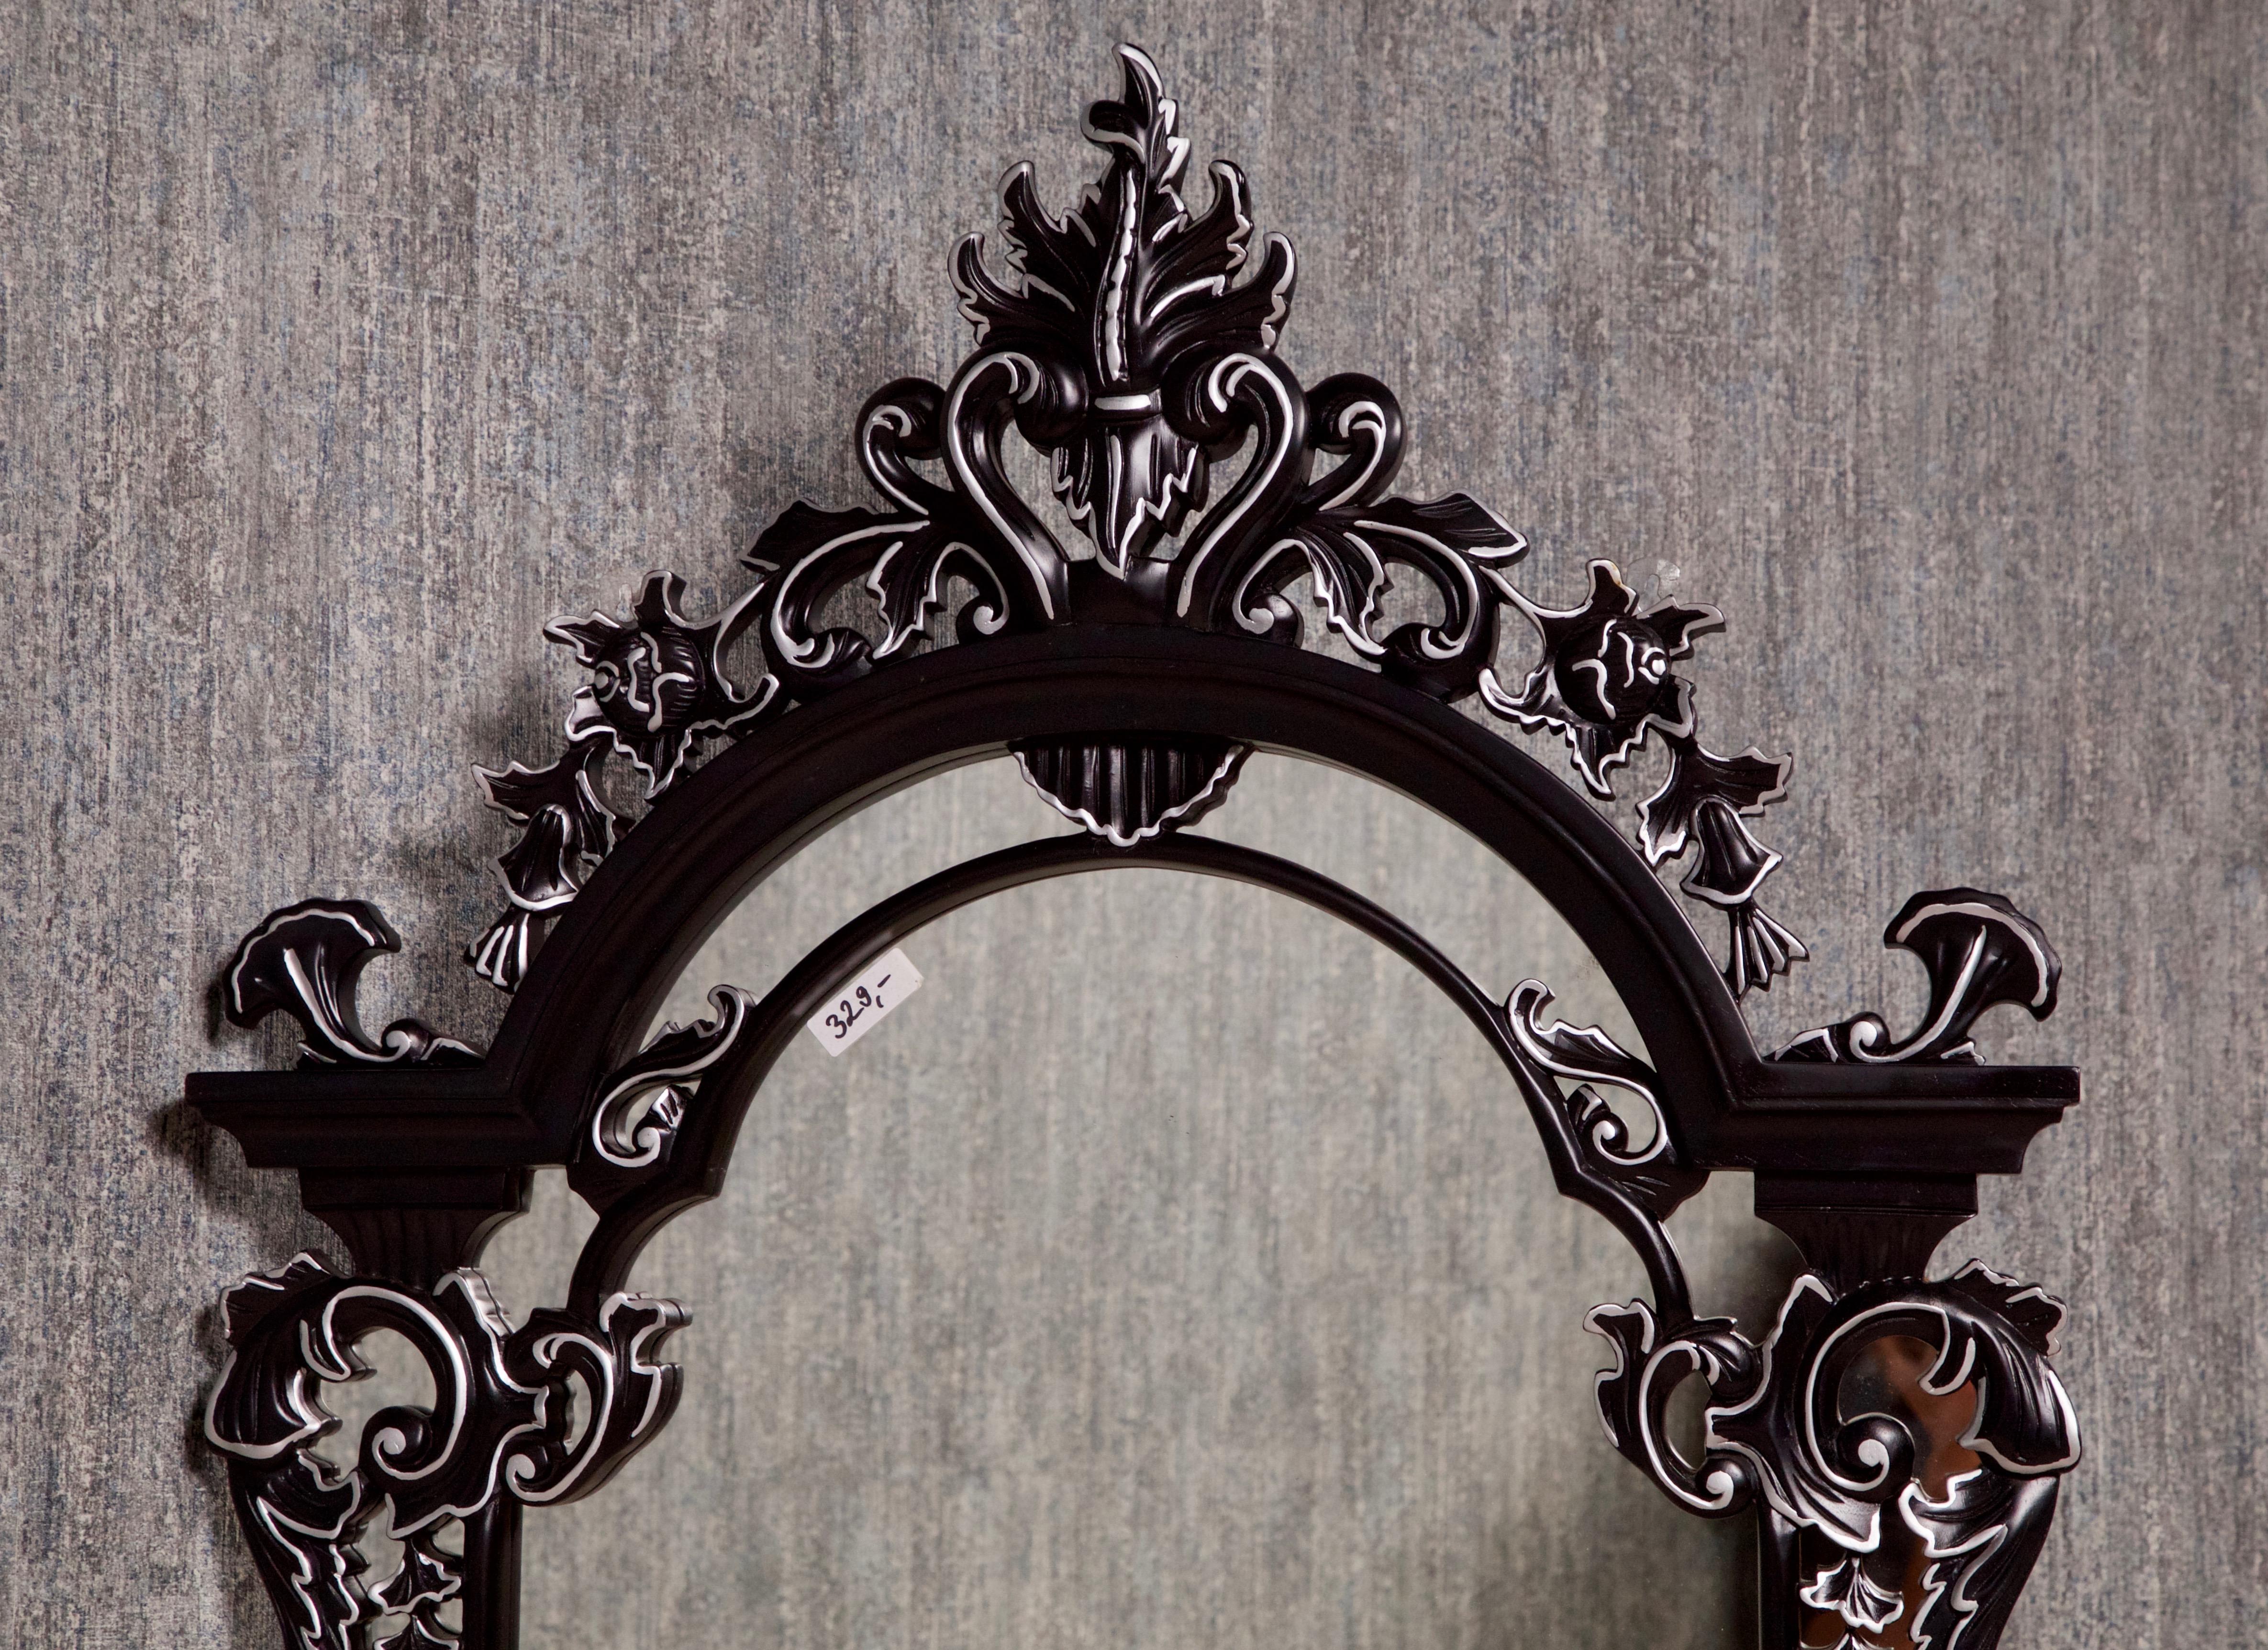 Barock wandspiegel schwarz silber schminktische spiegel shop repro antik design - Barock wandspiegel silber ...